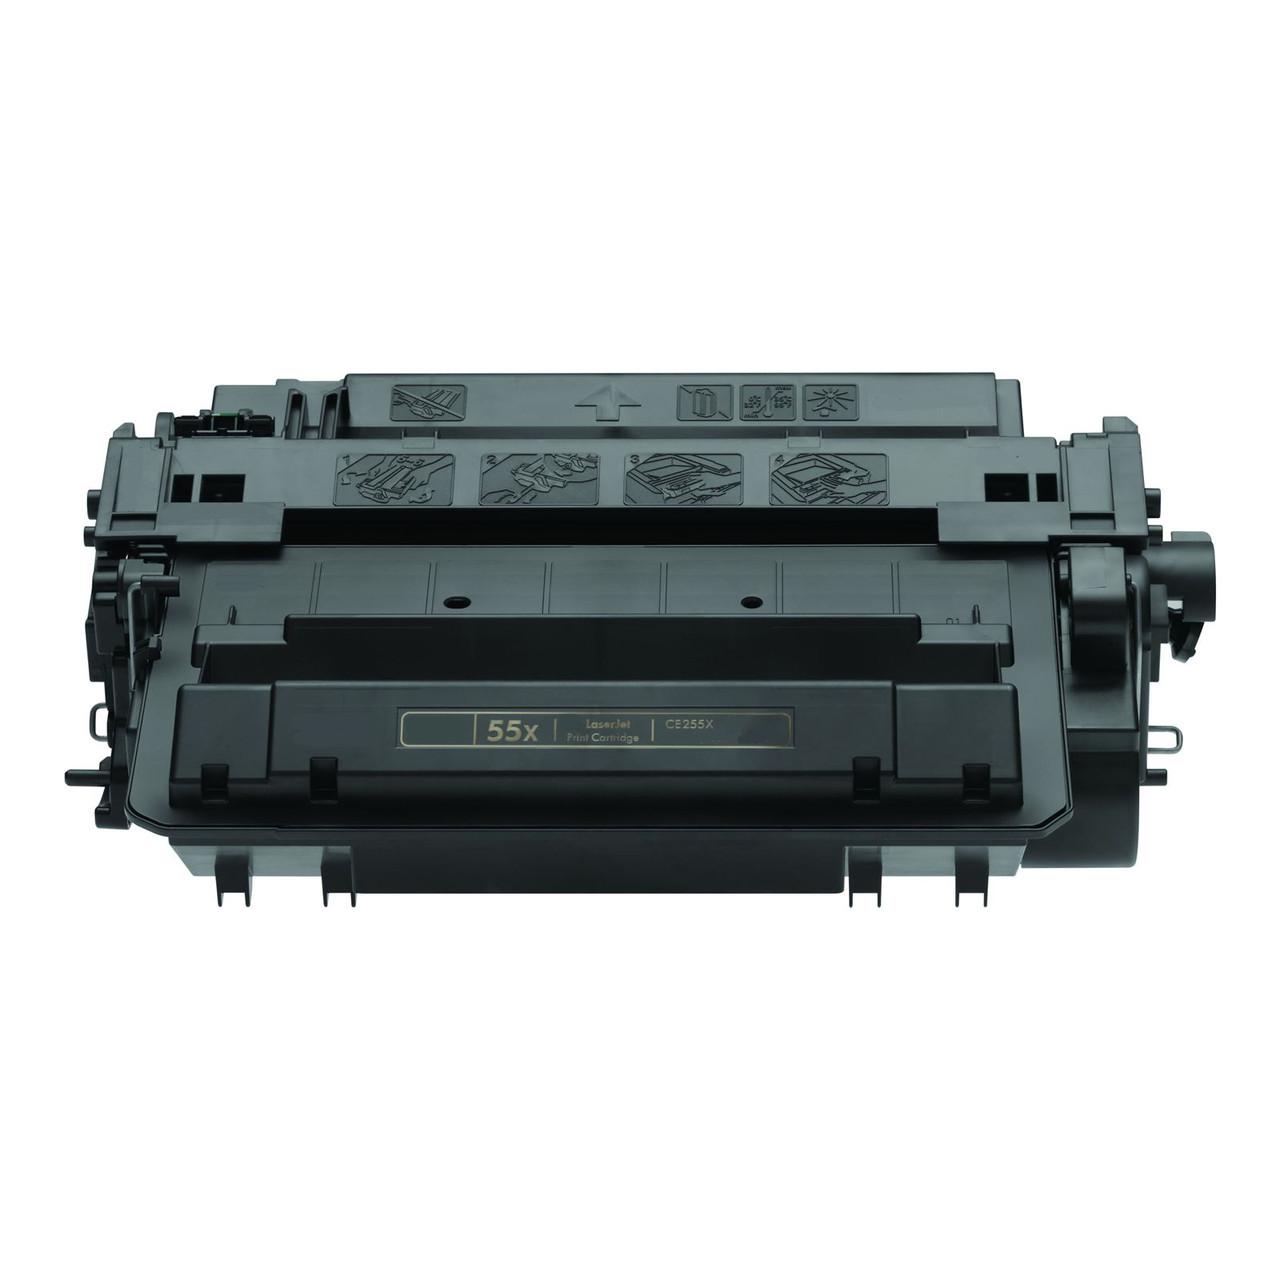 Remanufactured HP CE255X Black Toner Cartridge